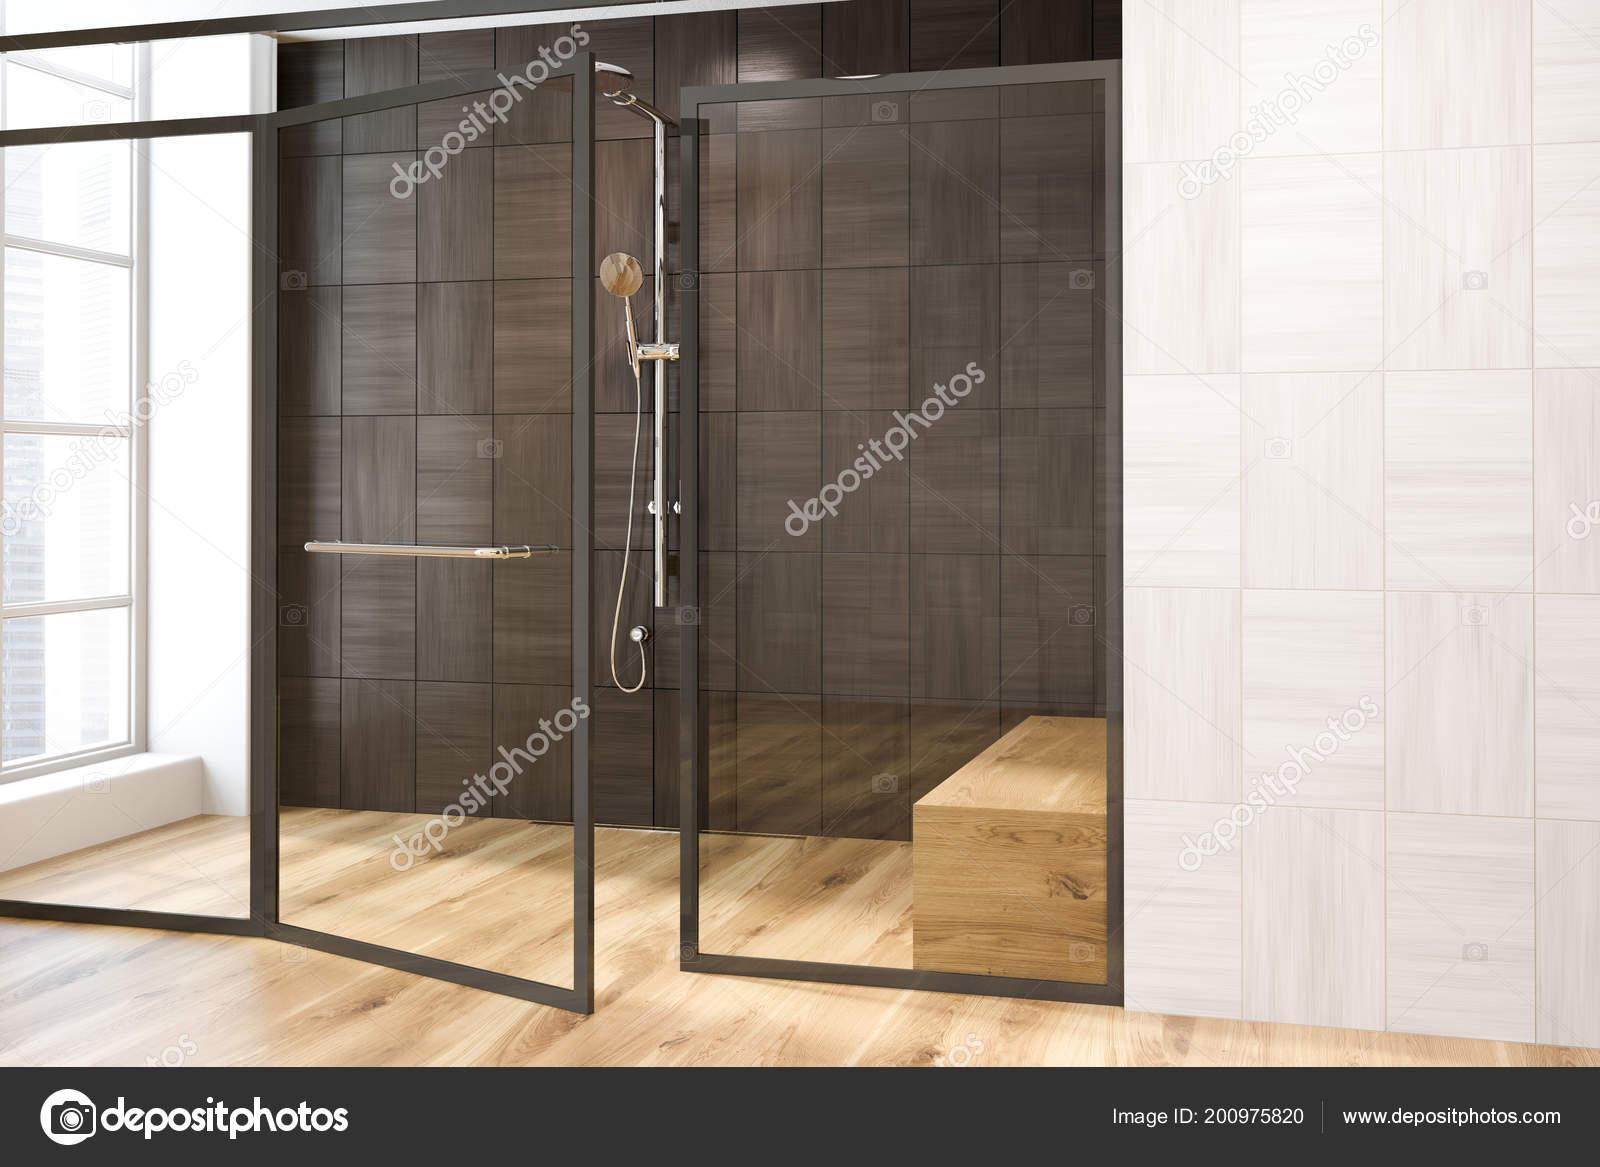 White Black Wooden Wall Bathroom Interior Shower Stall Bench ...